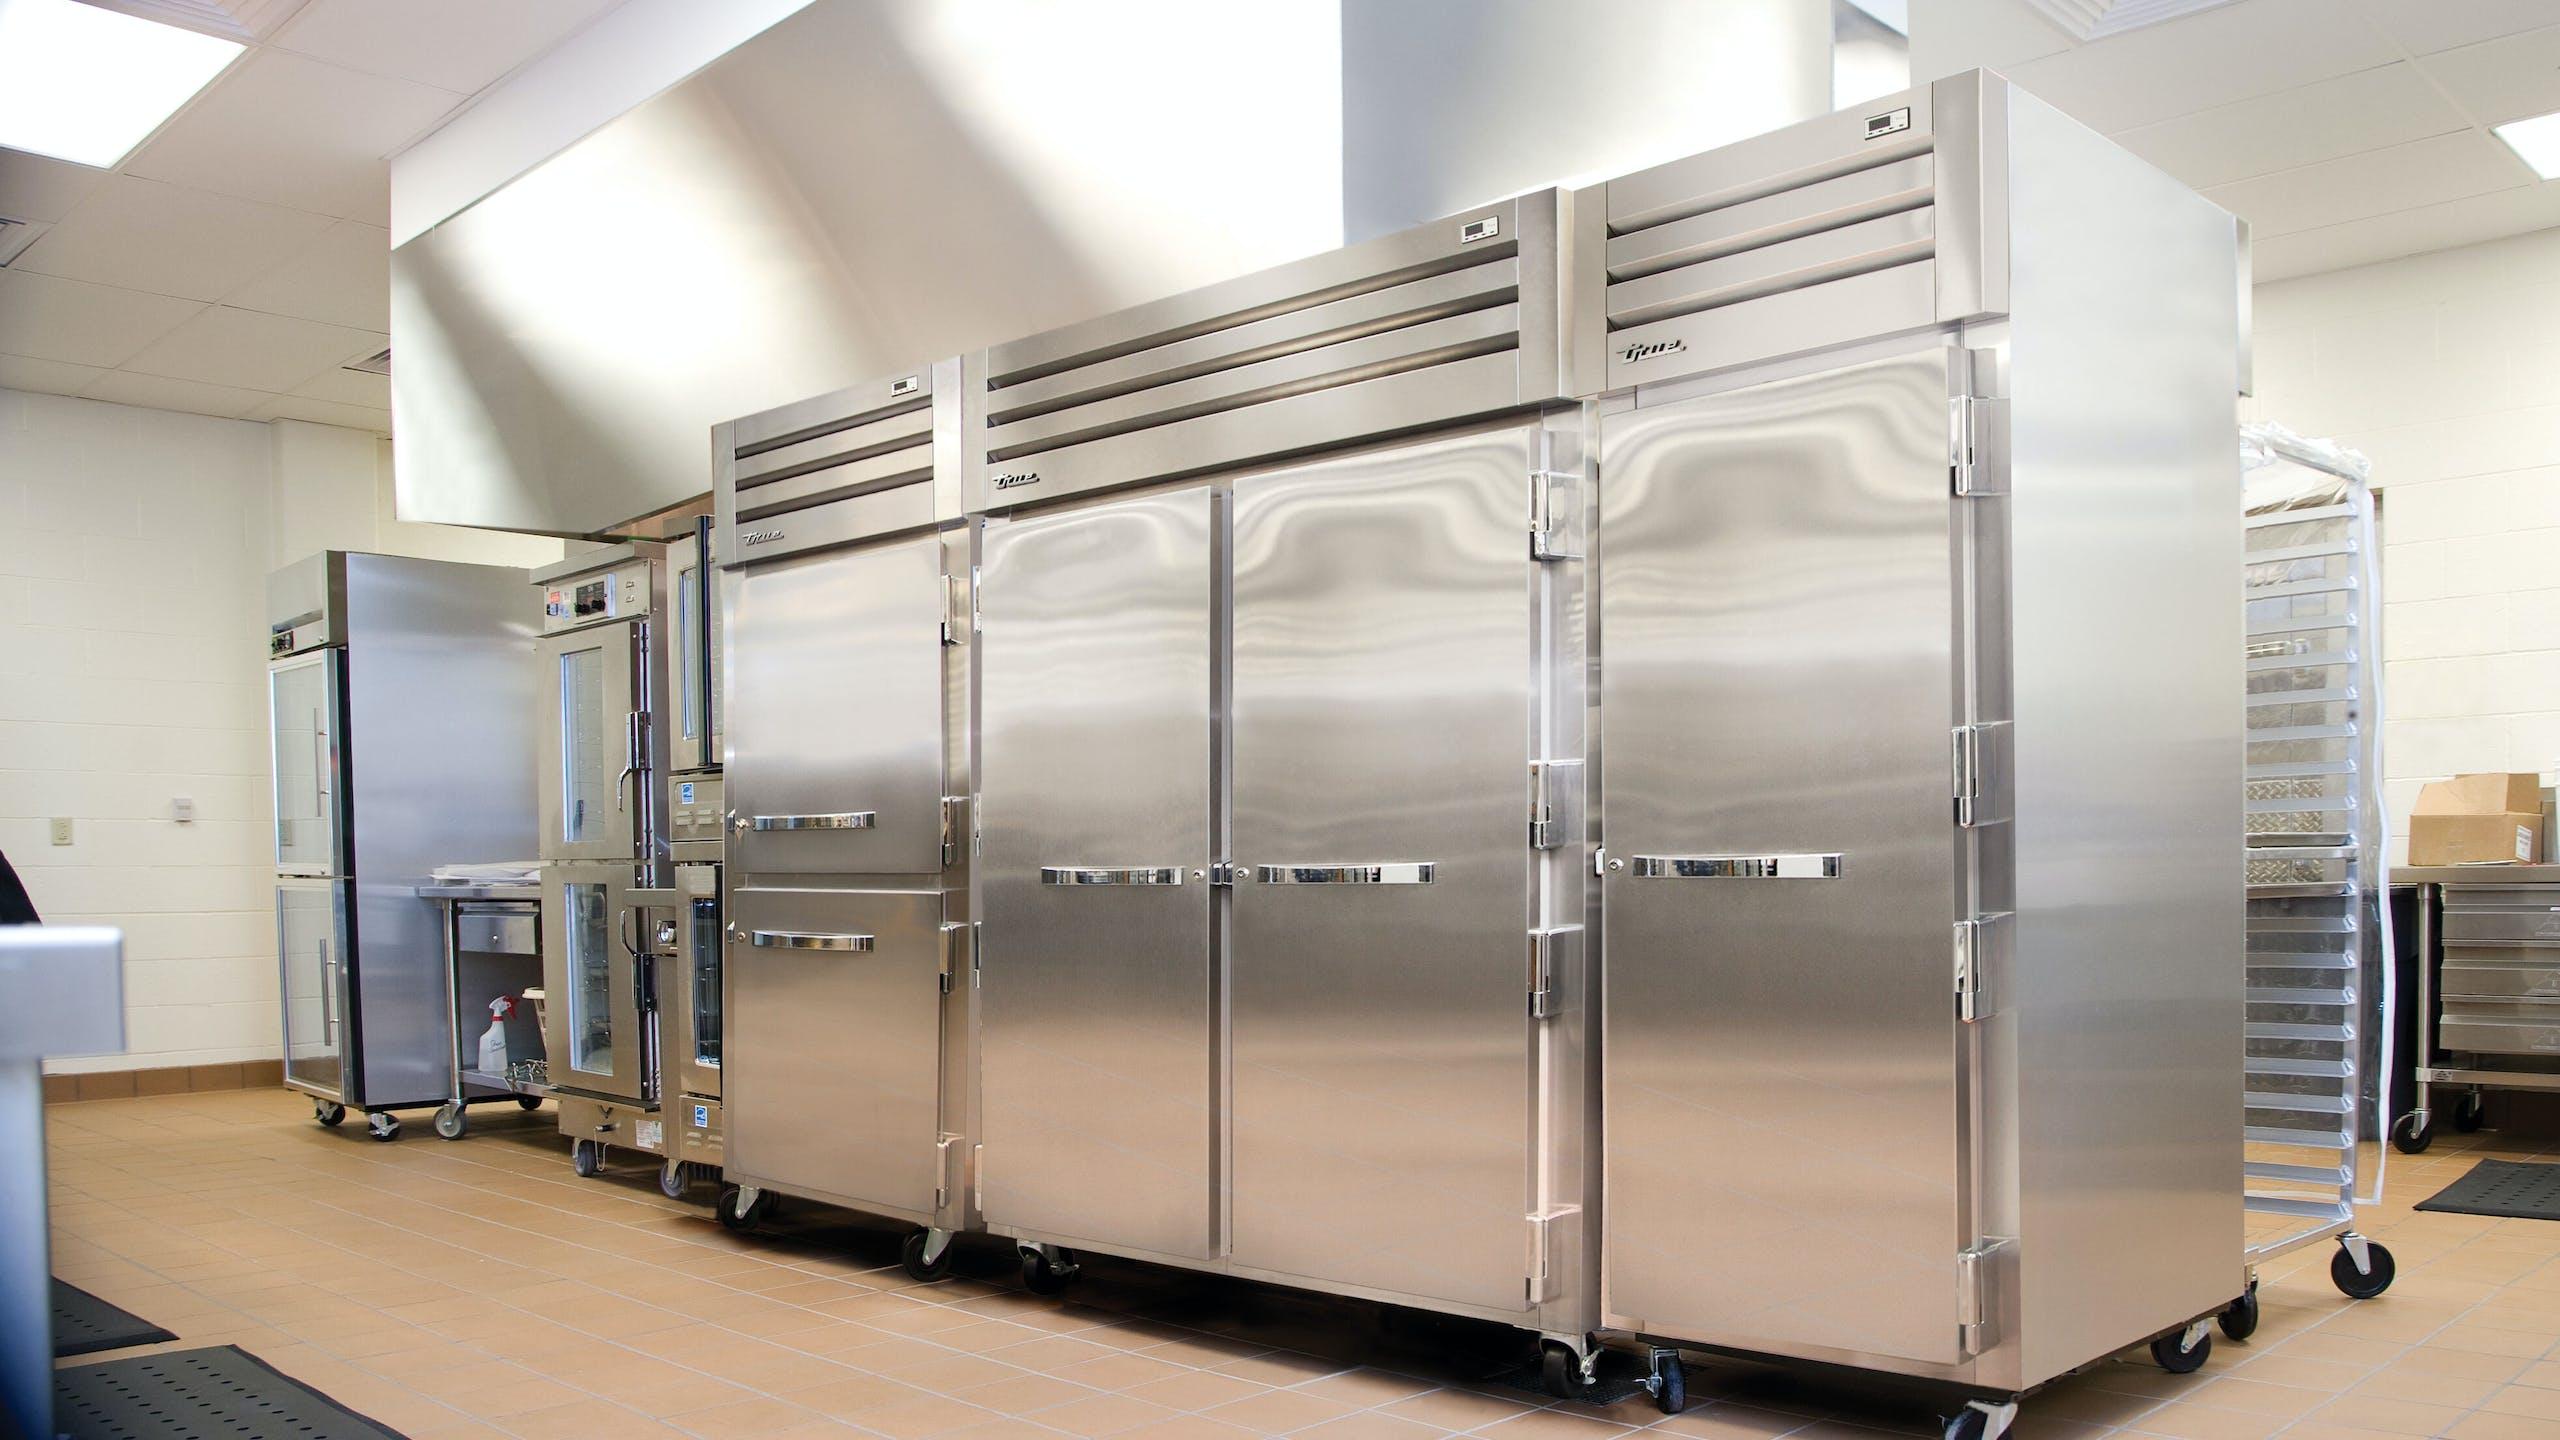 Infor Distribution SX.e Case Study - American Refrigeration Supplies, Inc.